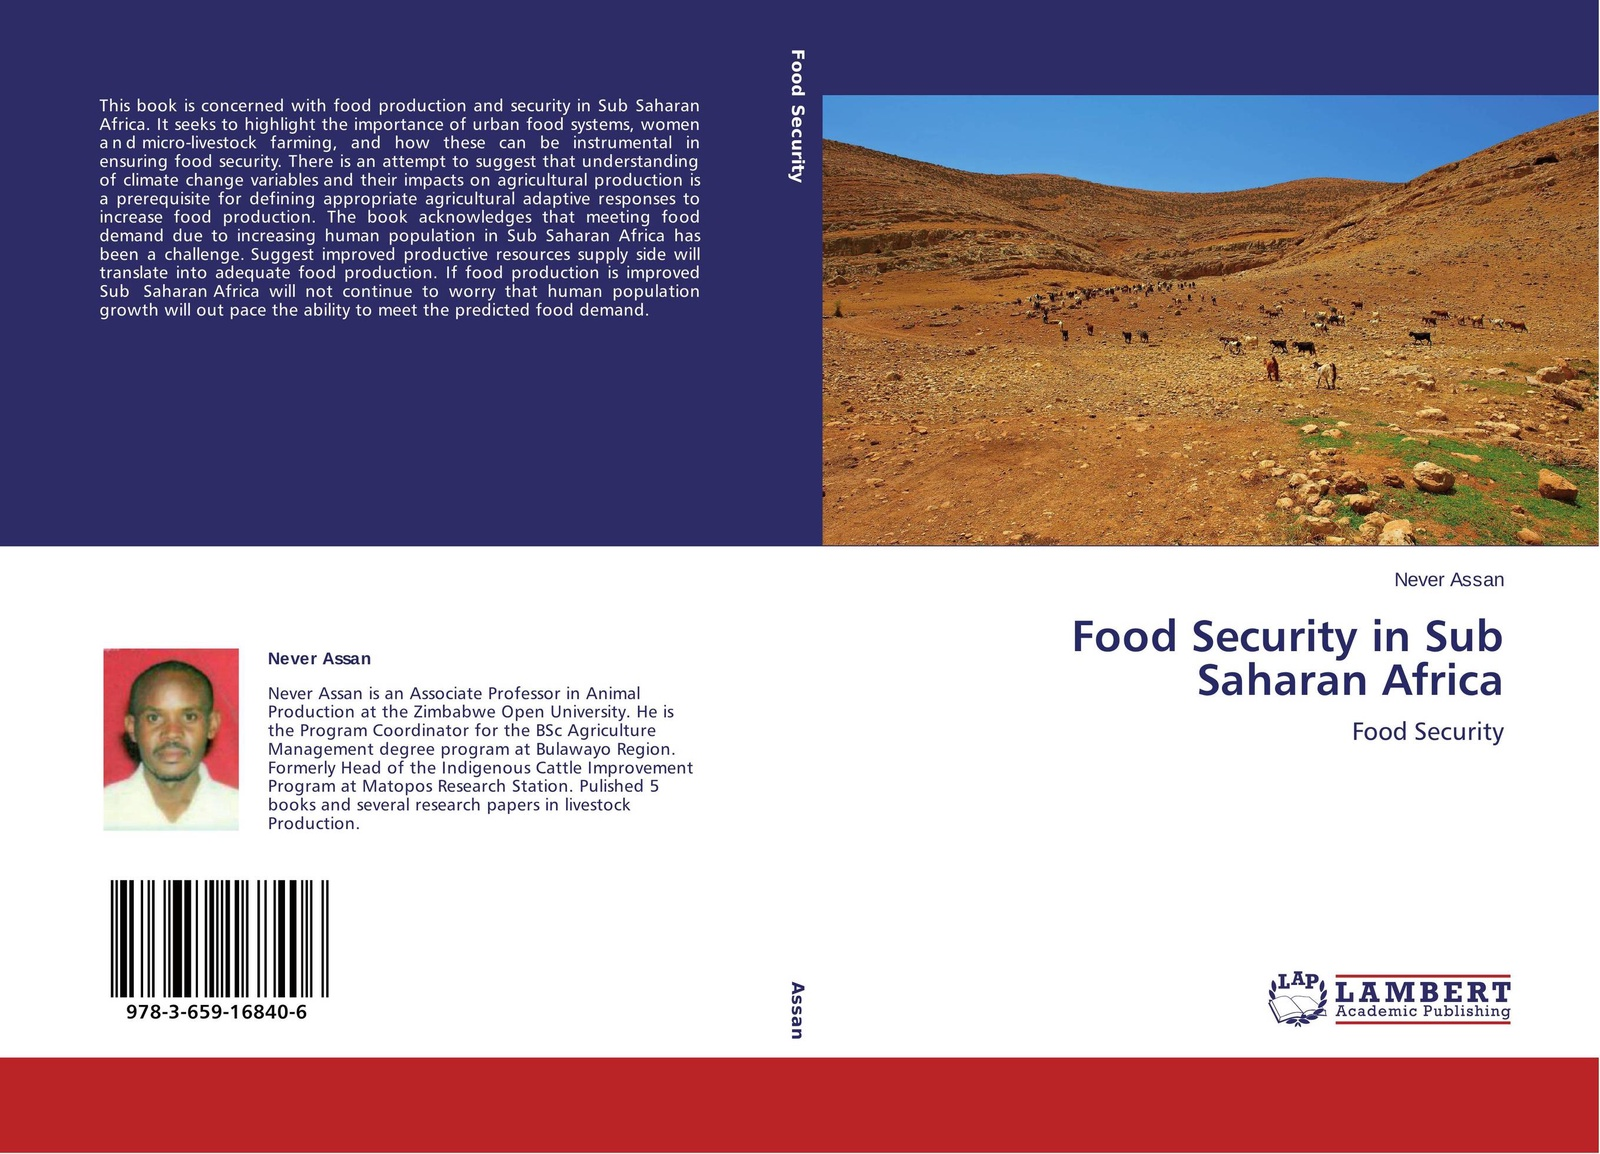 Never Assan Food Security in Sub Saharan Africa wayne martindale global food security and supply